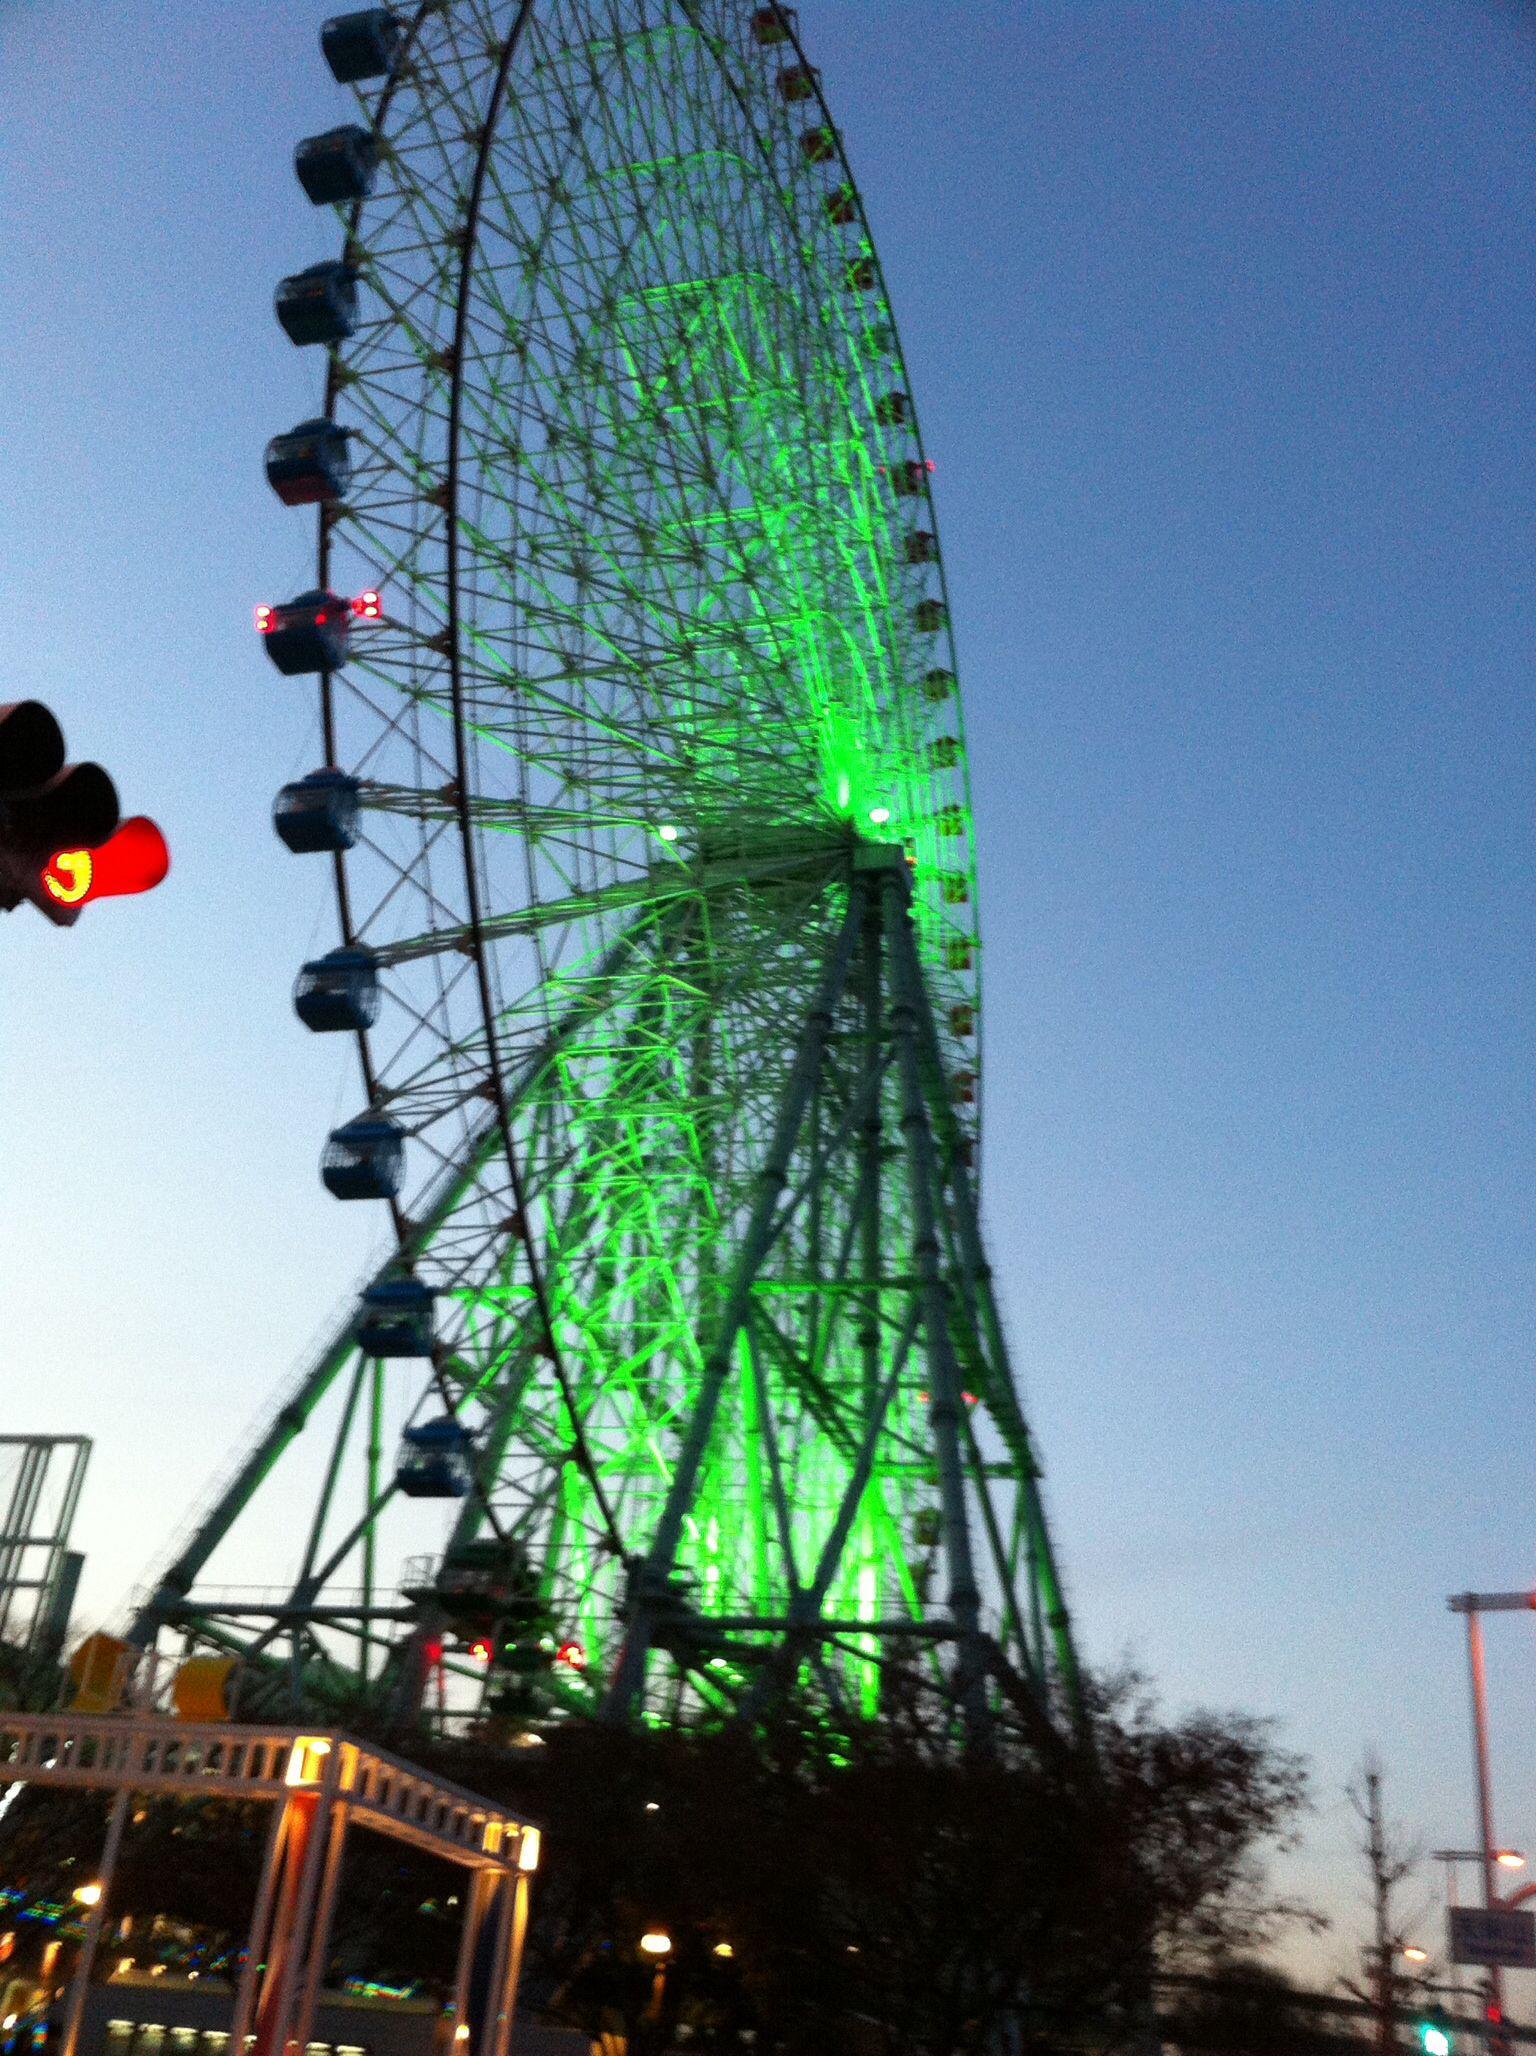 Tempozan Giant Ferris Wheel. Tempozan Harbor Village, Osaka, Japan.